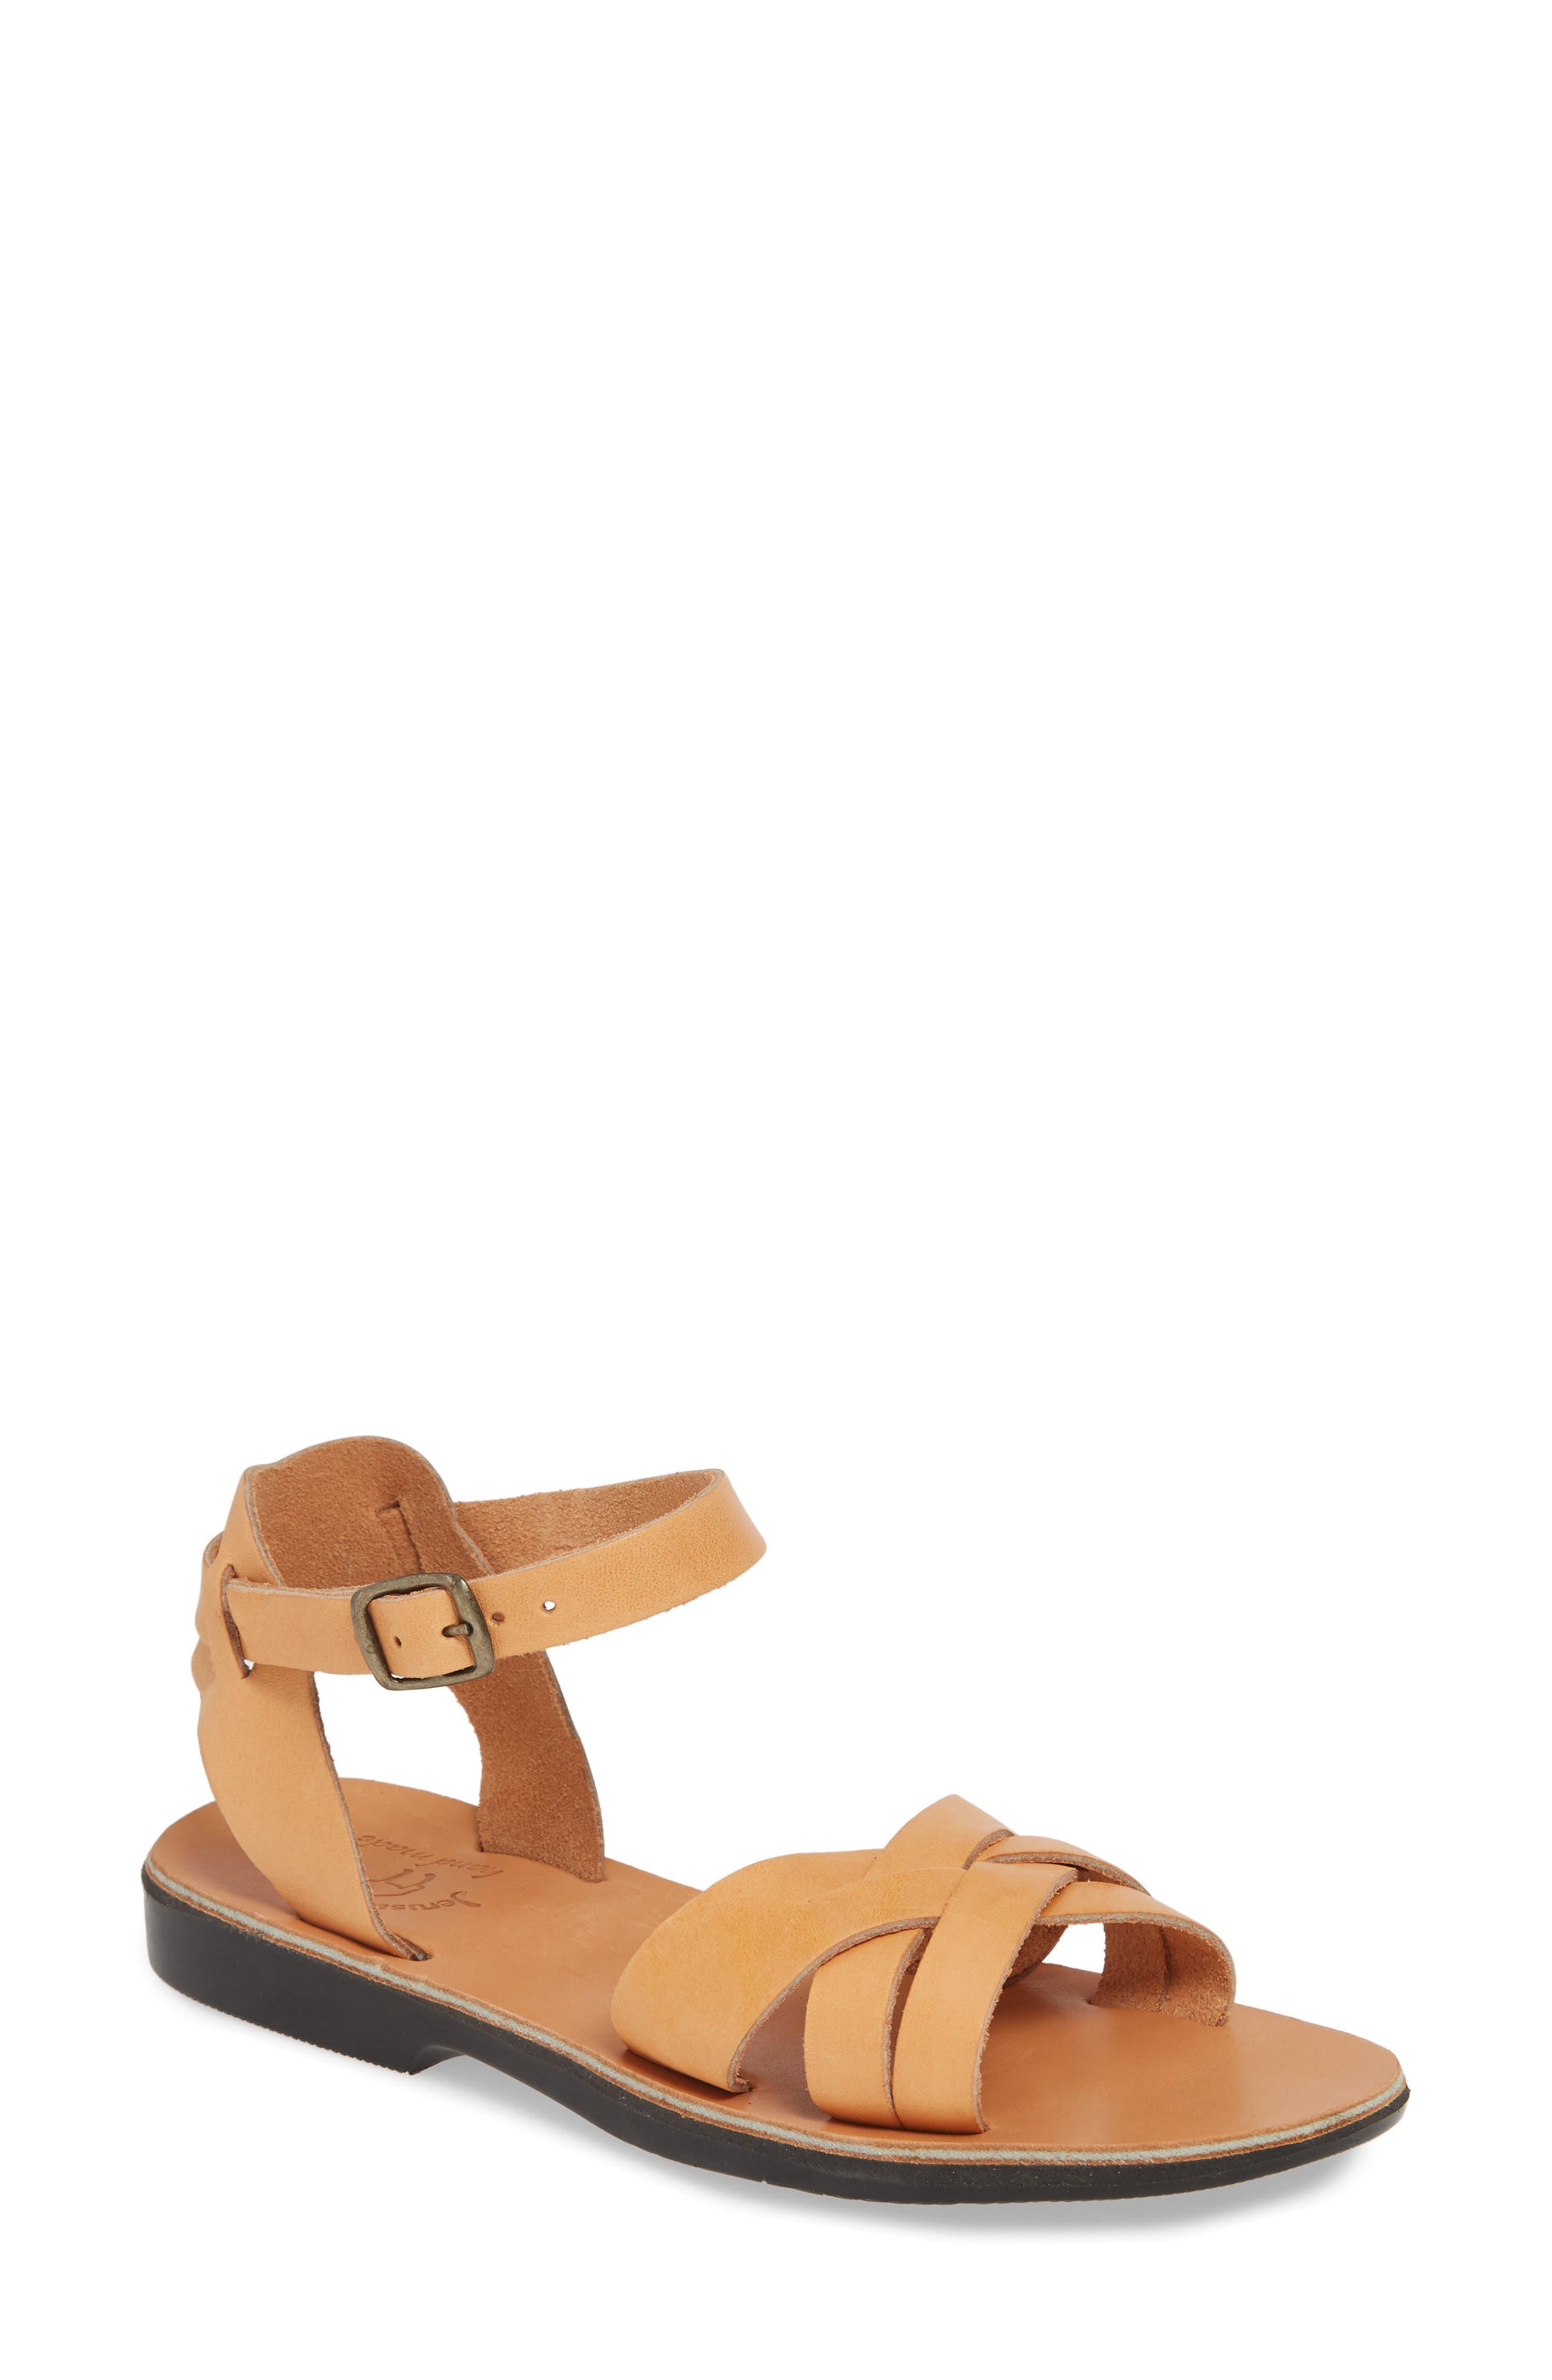 Chloe Ankle Strap Sandal